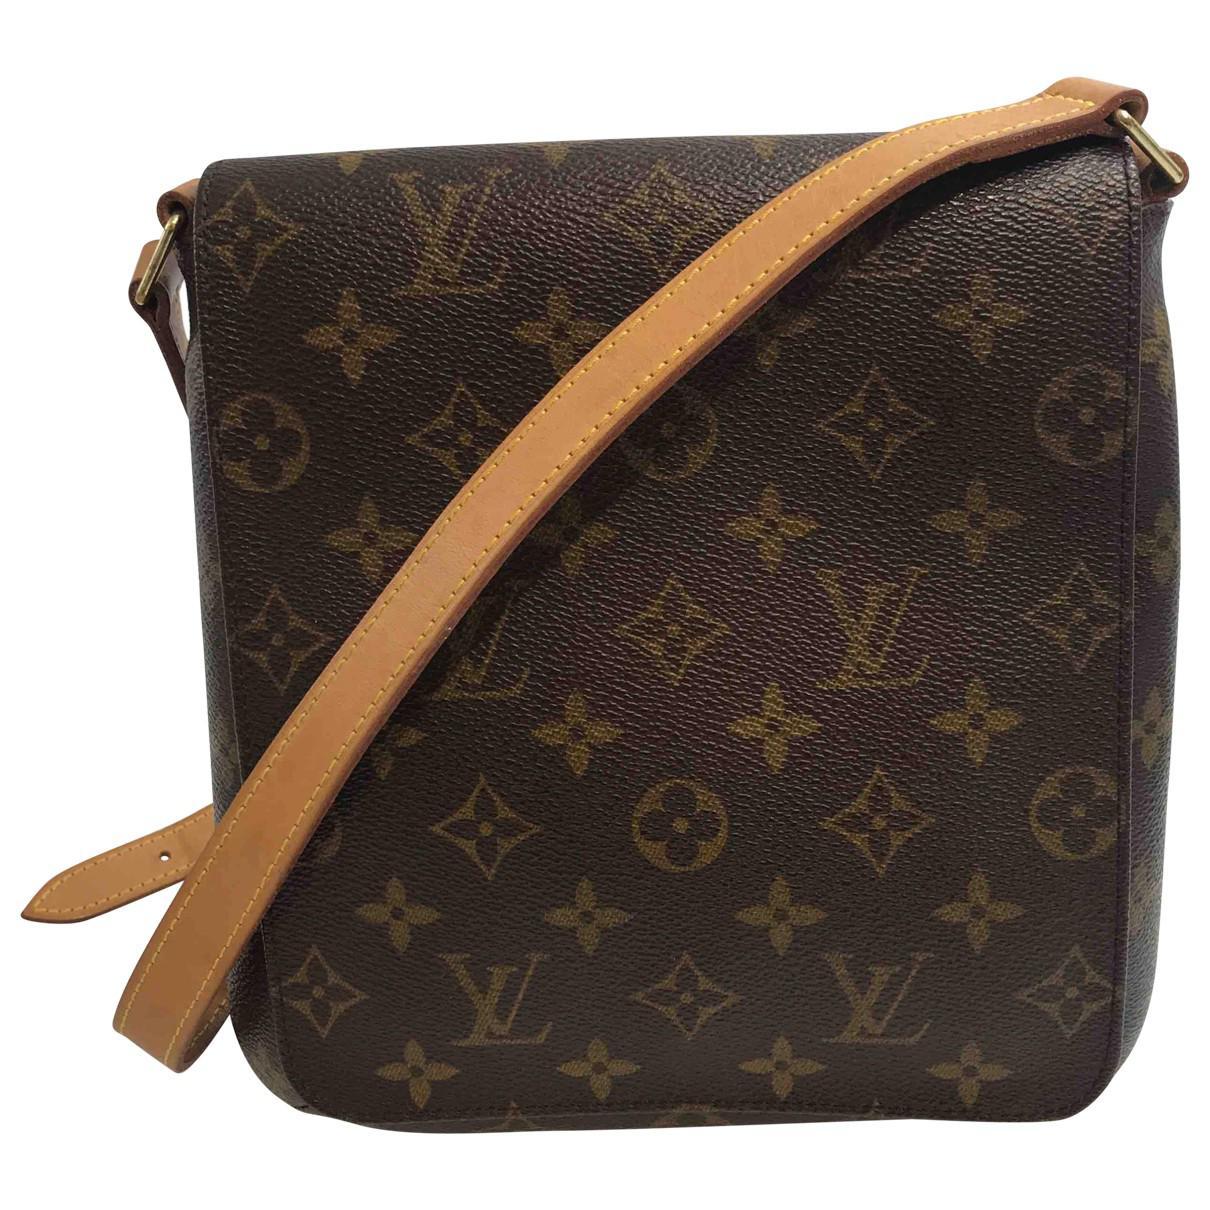 Louis Vuitton Pre-owned - Salsa cloth crossbody bag 7mYDVzNb